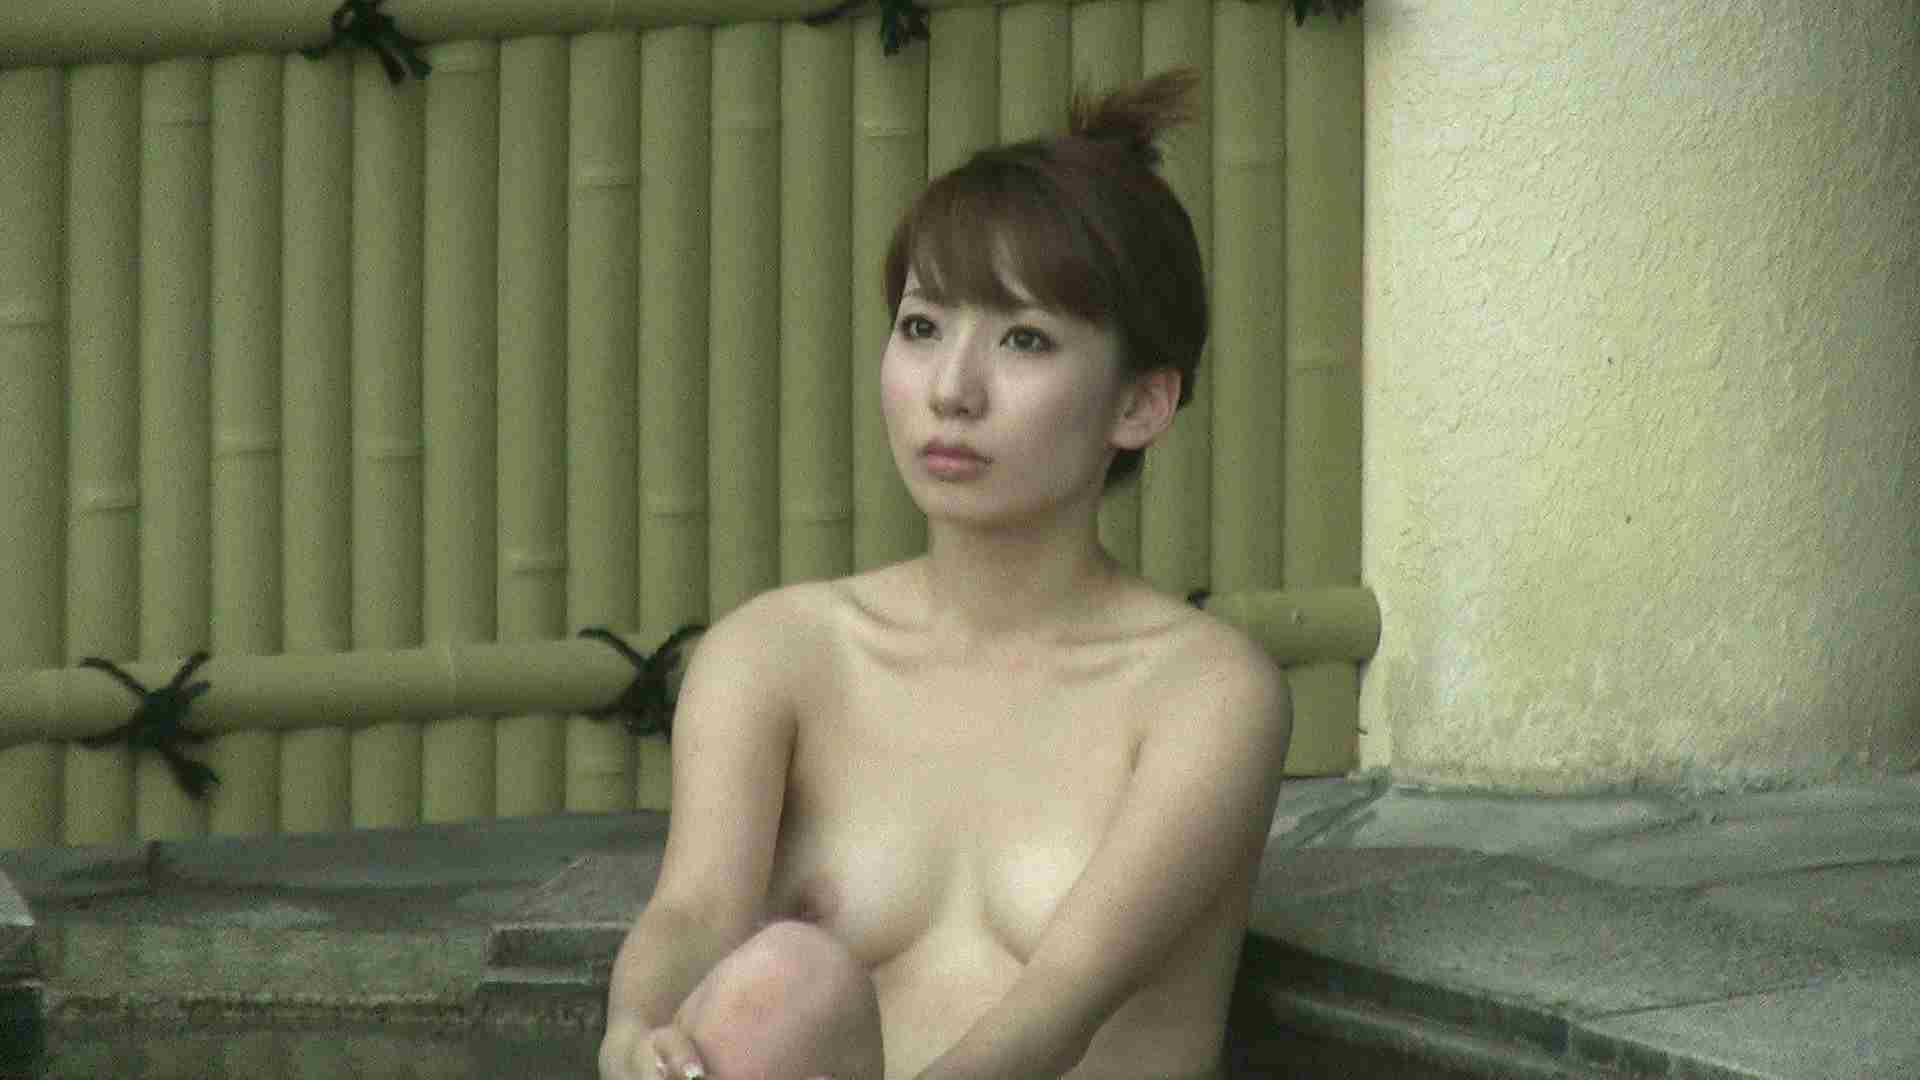 Aquaな露天風呂Vol.208 0  78連発 8